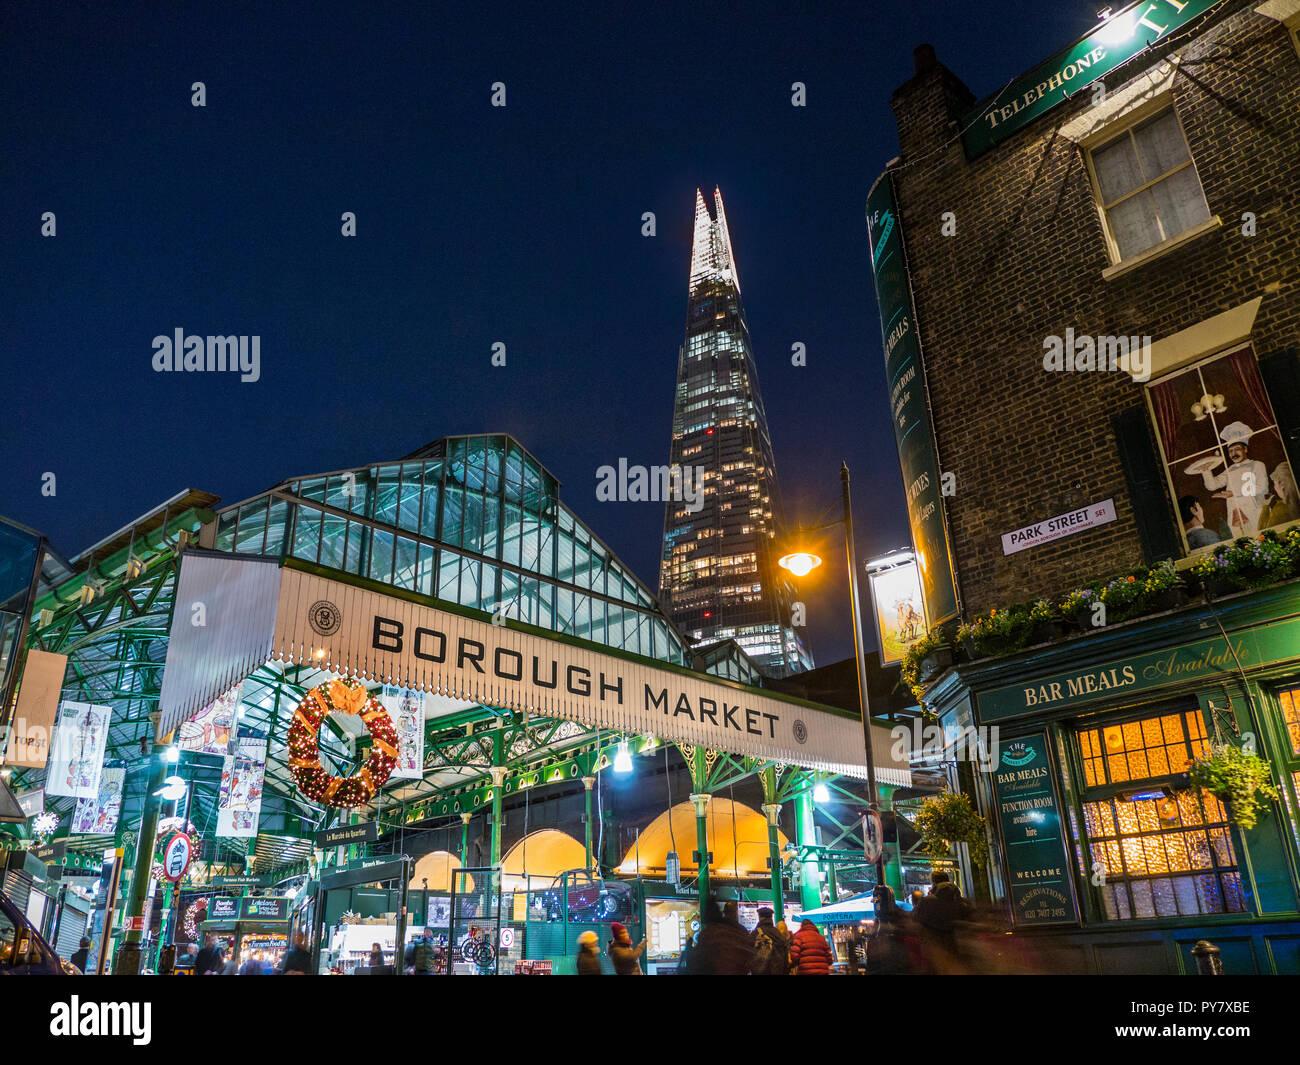 Christmas Borough Market exterior entrance & Christmas shoppers, lights night with Christmas wreaths London Shard Tower behind Southwark London UK - Stock Image